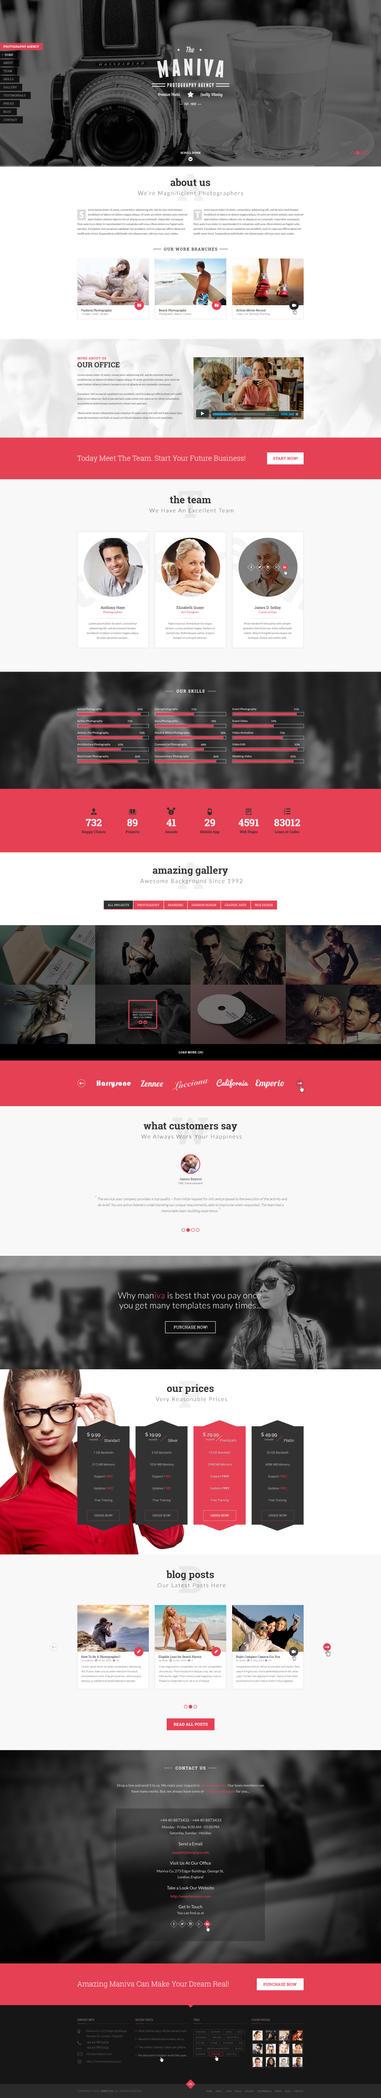 Photography Agency - Maniva WordPress Theme by templaza